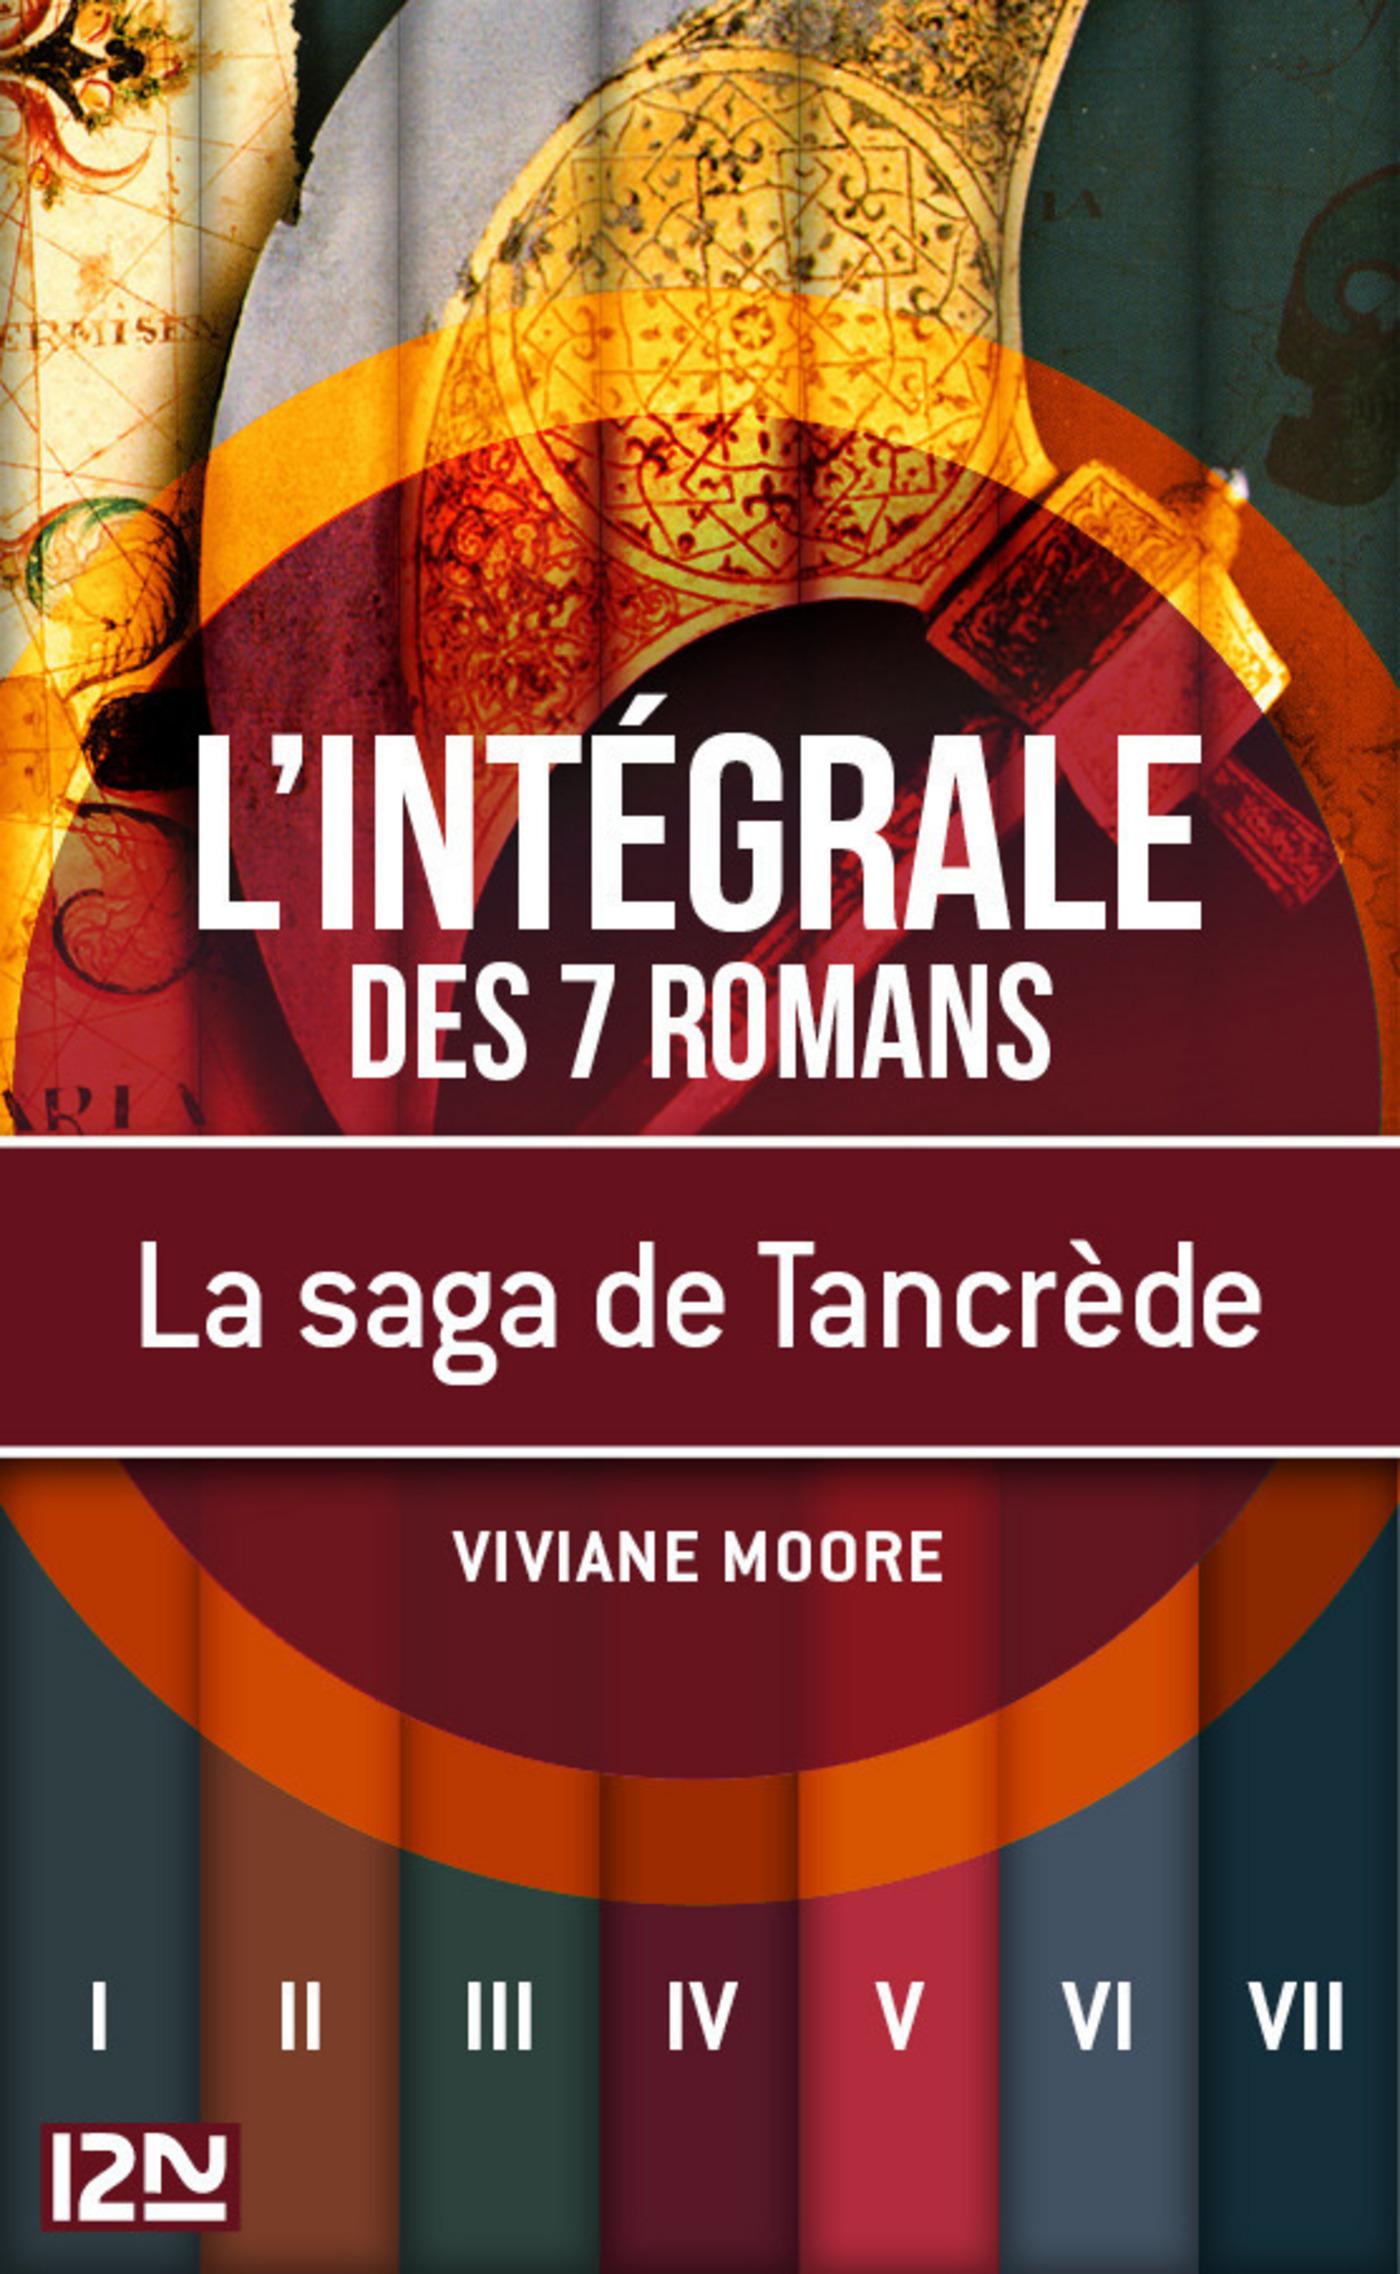 La saga de Tancrède le Normand - intégrale | MOORE, Viviane